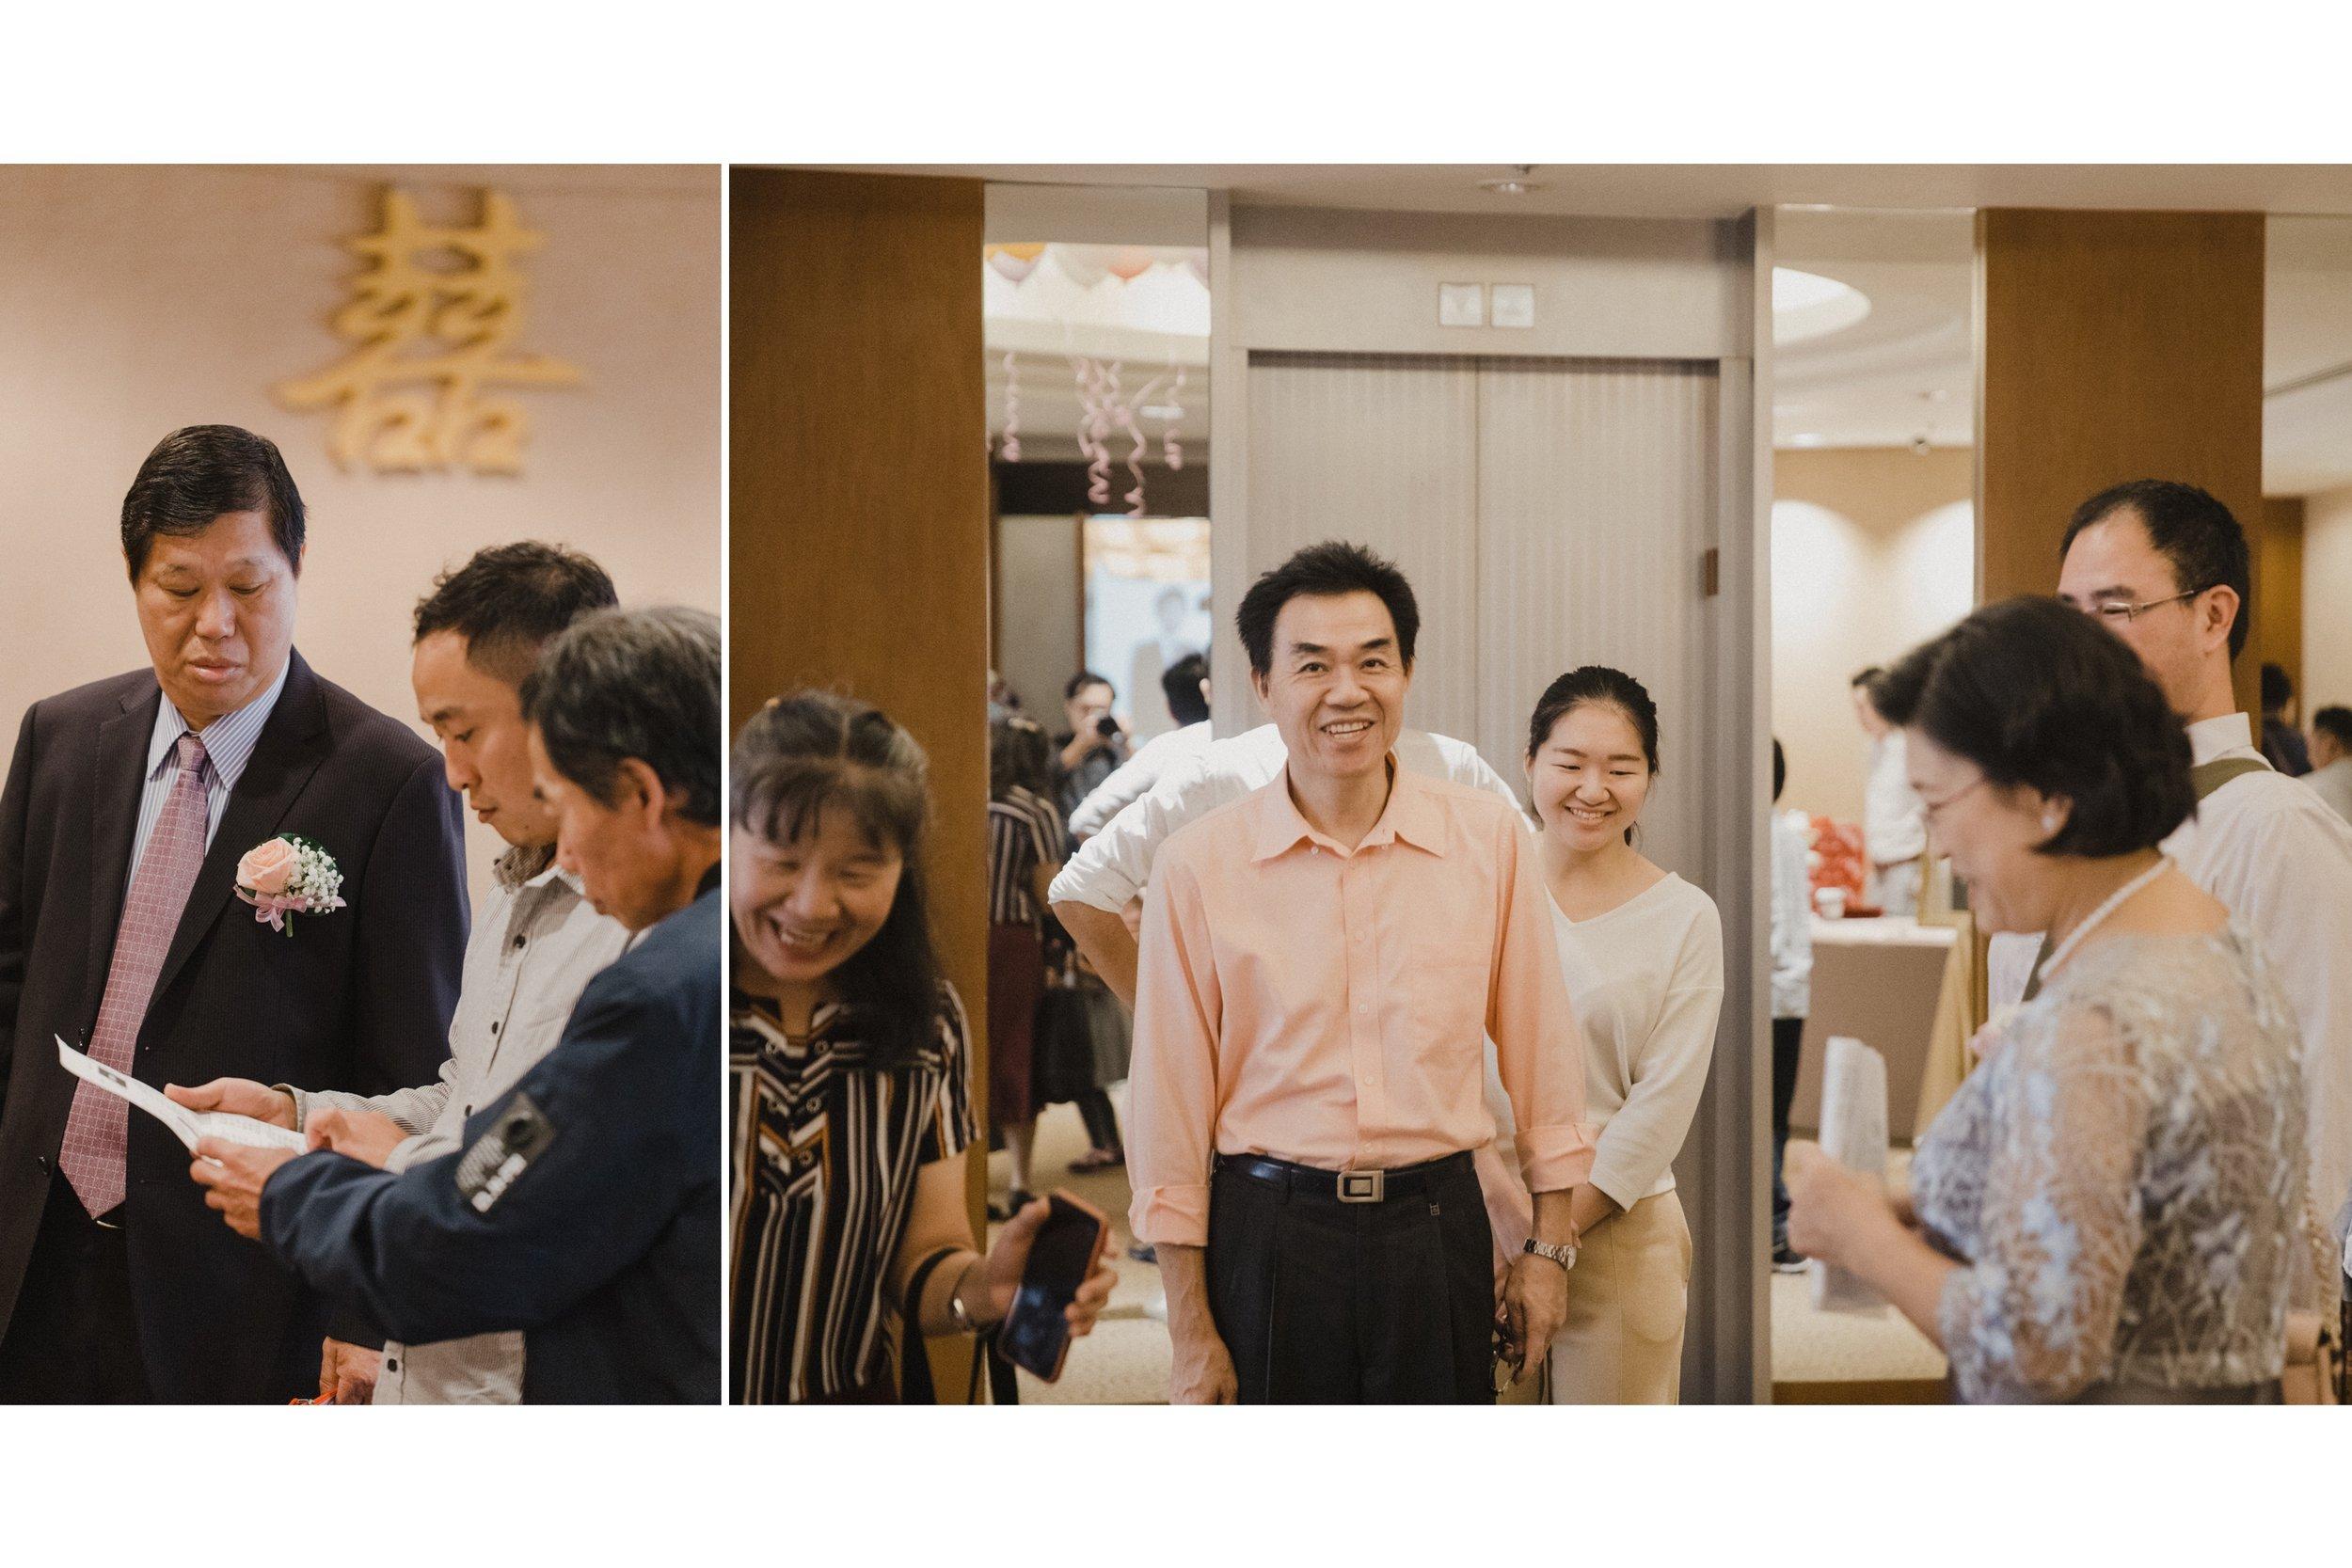 wedding-caridee-oscar-lunch-ambassador-hsinchu-結婚午宴-新竹國賓_39.jpg